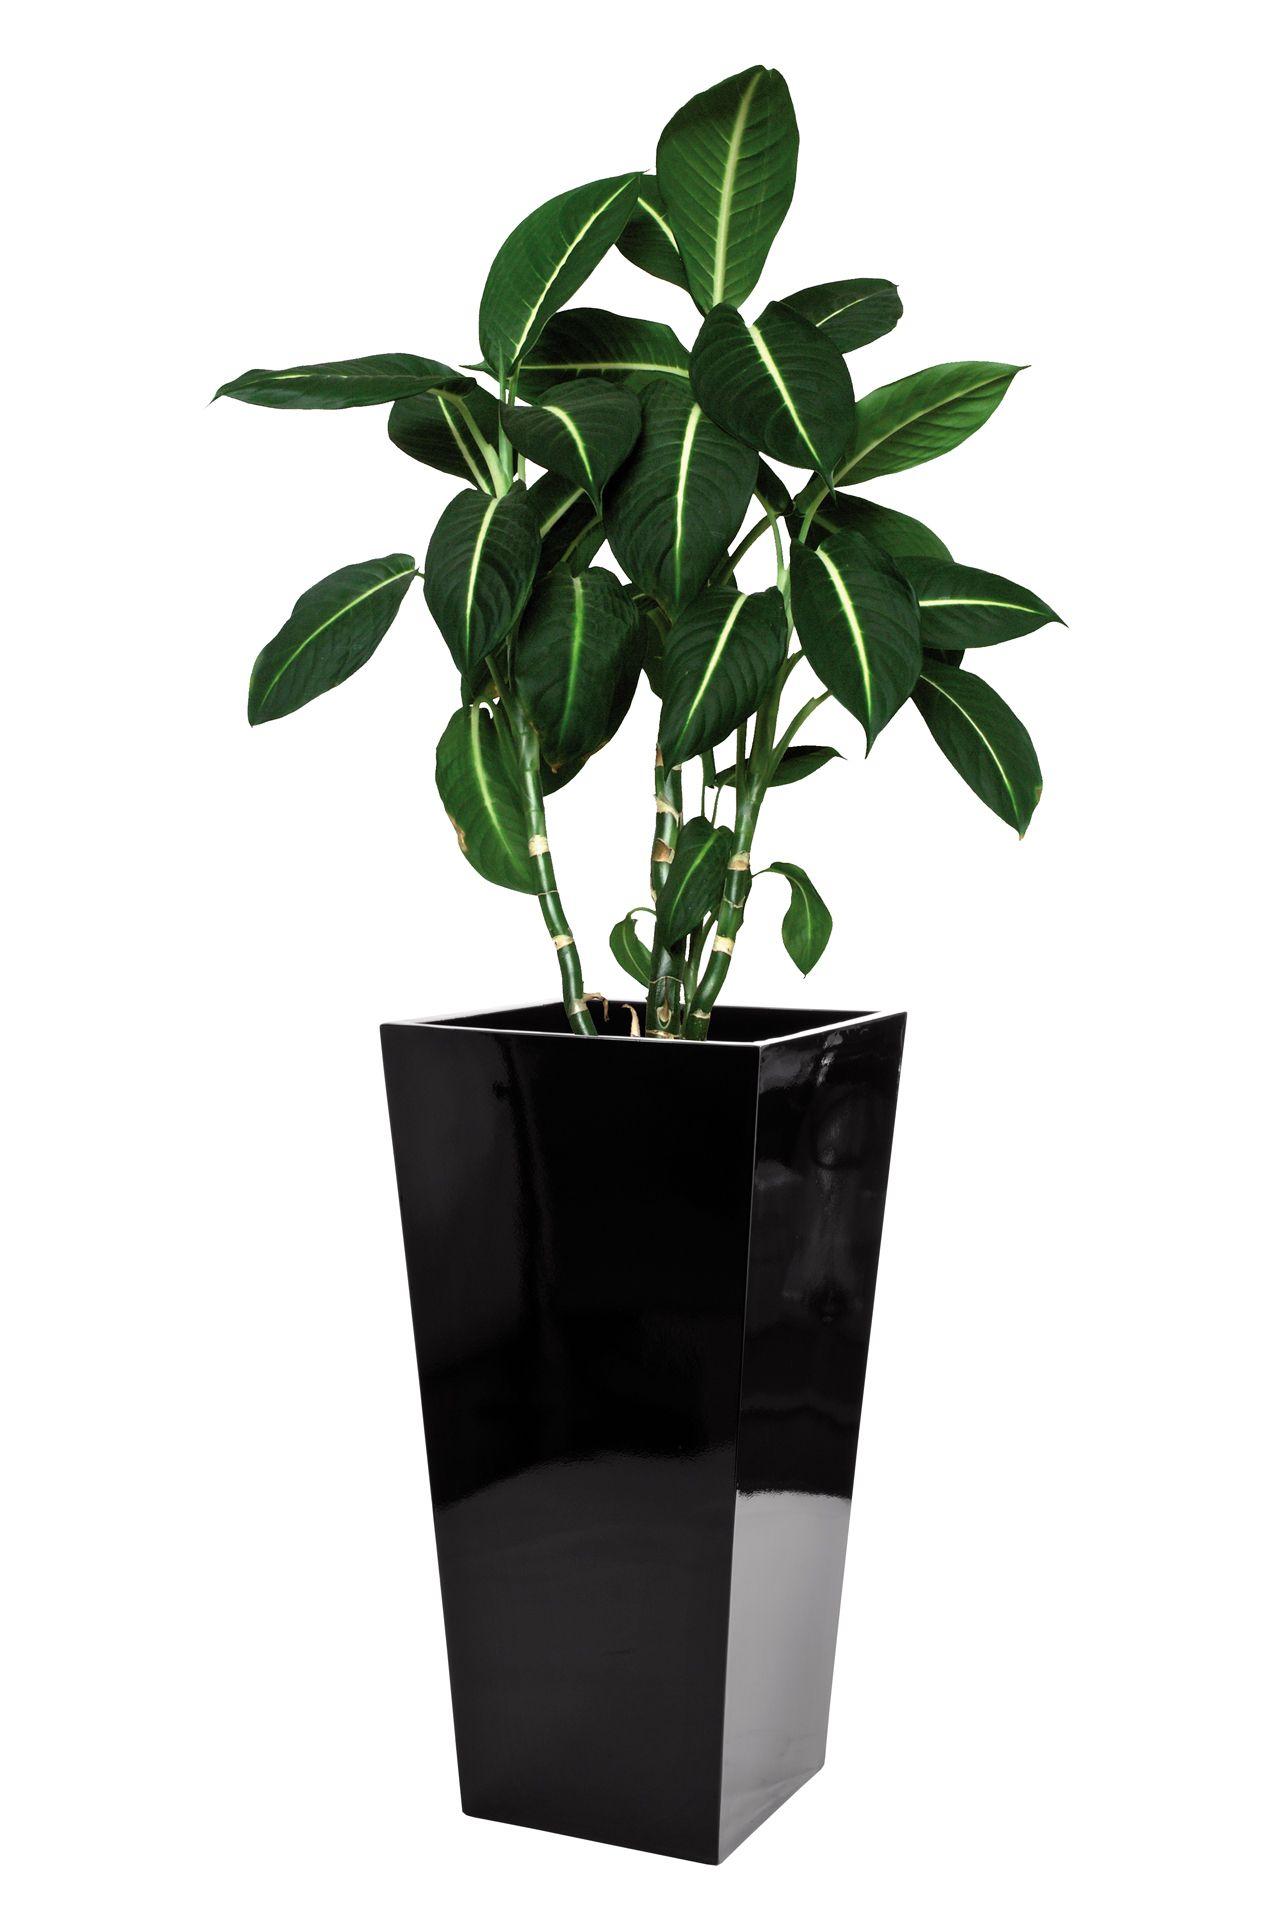 blumenk bel pflanzk bel pflanzgef e fiberglas classic 90cm schwarz hochglanz ebay. Black Bedroom Furniture Sets. Home Design Ideas